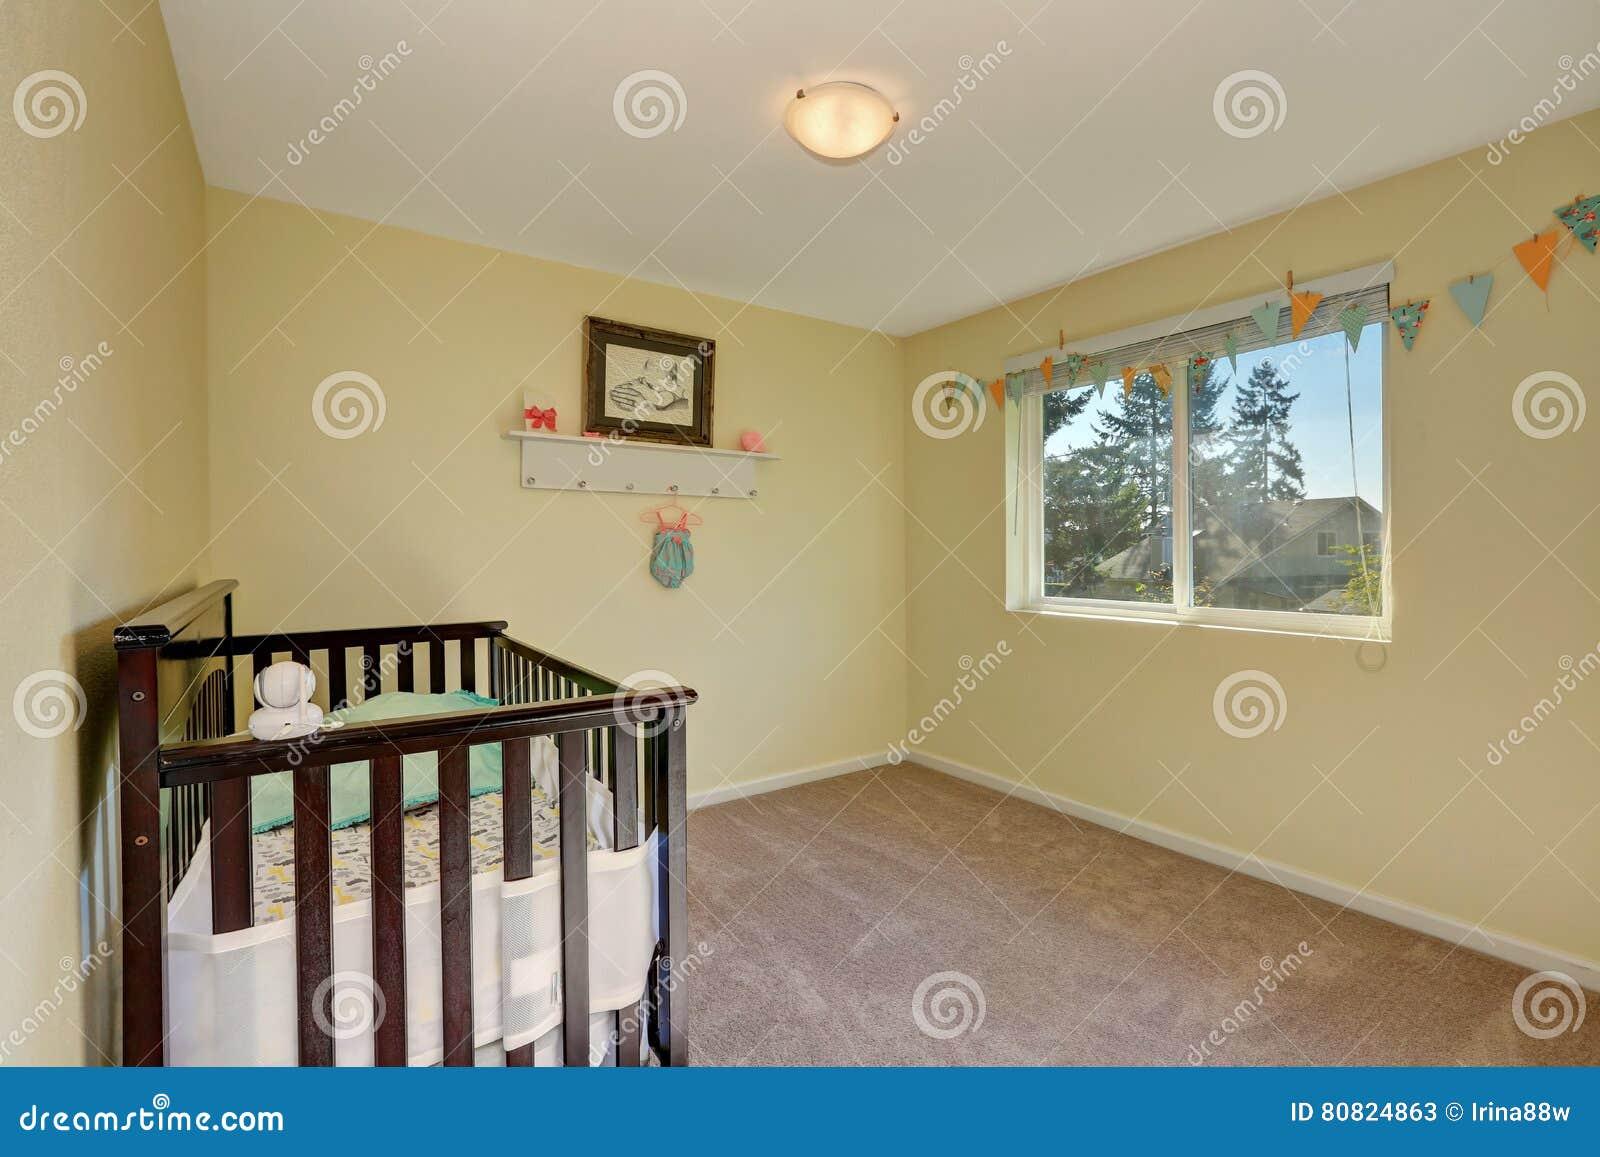 Sitio Adorable Del Cuarto De Ni Os Moqueta Interior Amarilla En  ~ Colores De Pintura Para Interiores